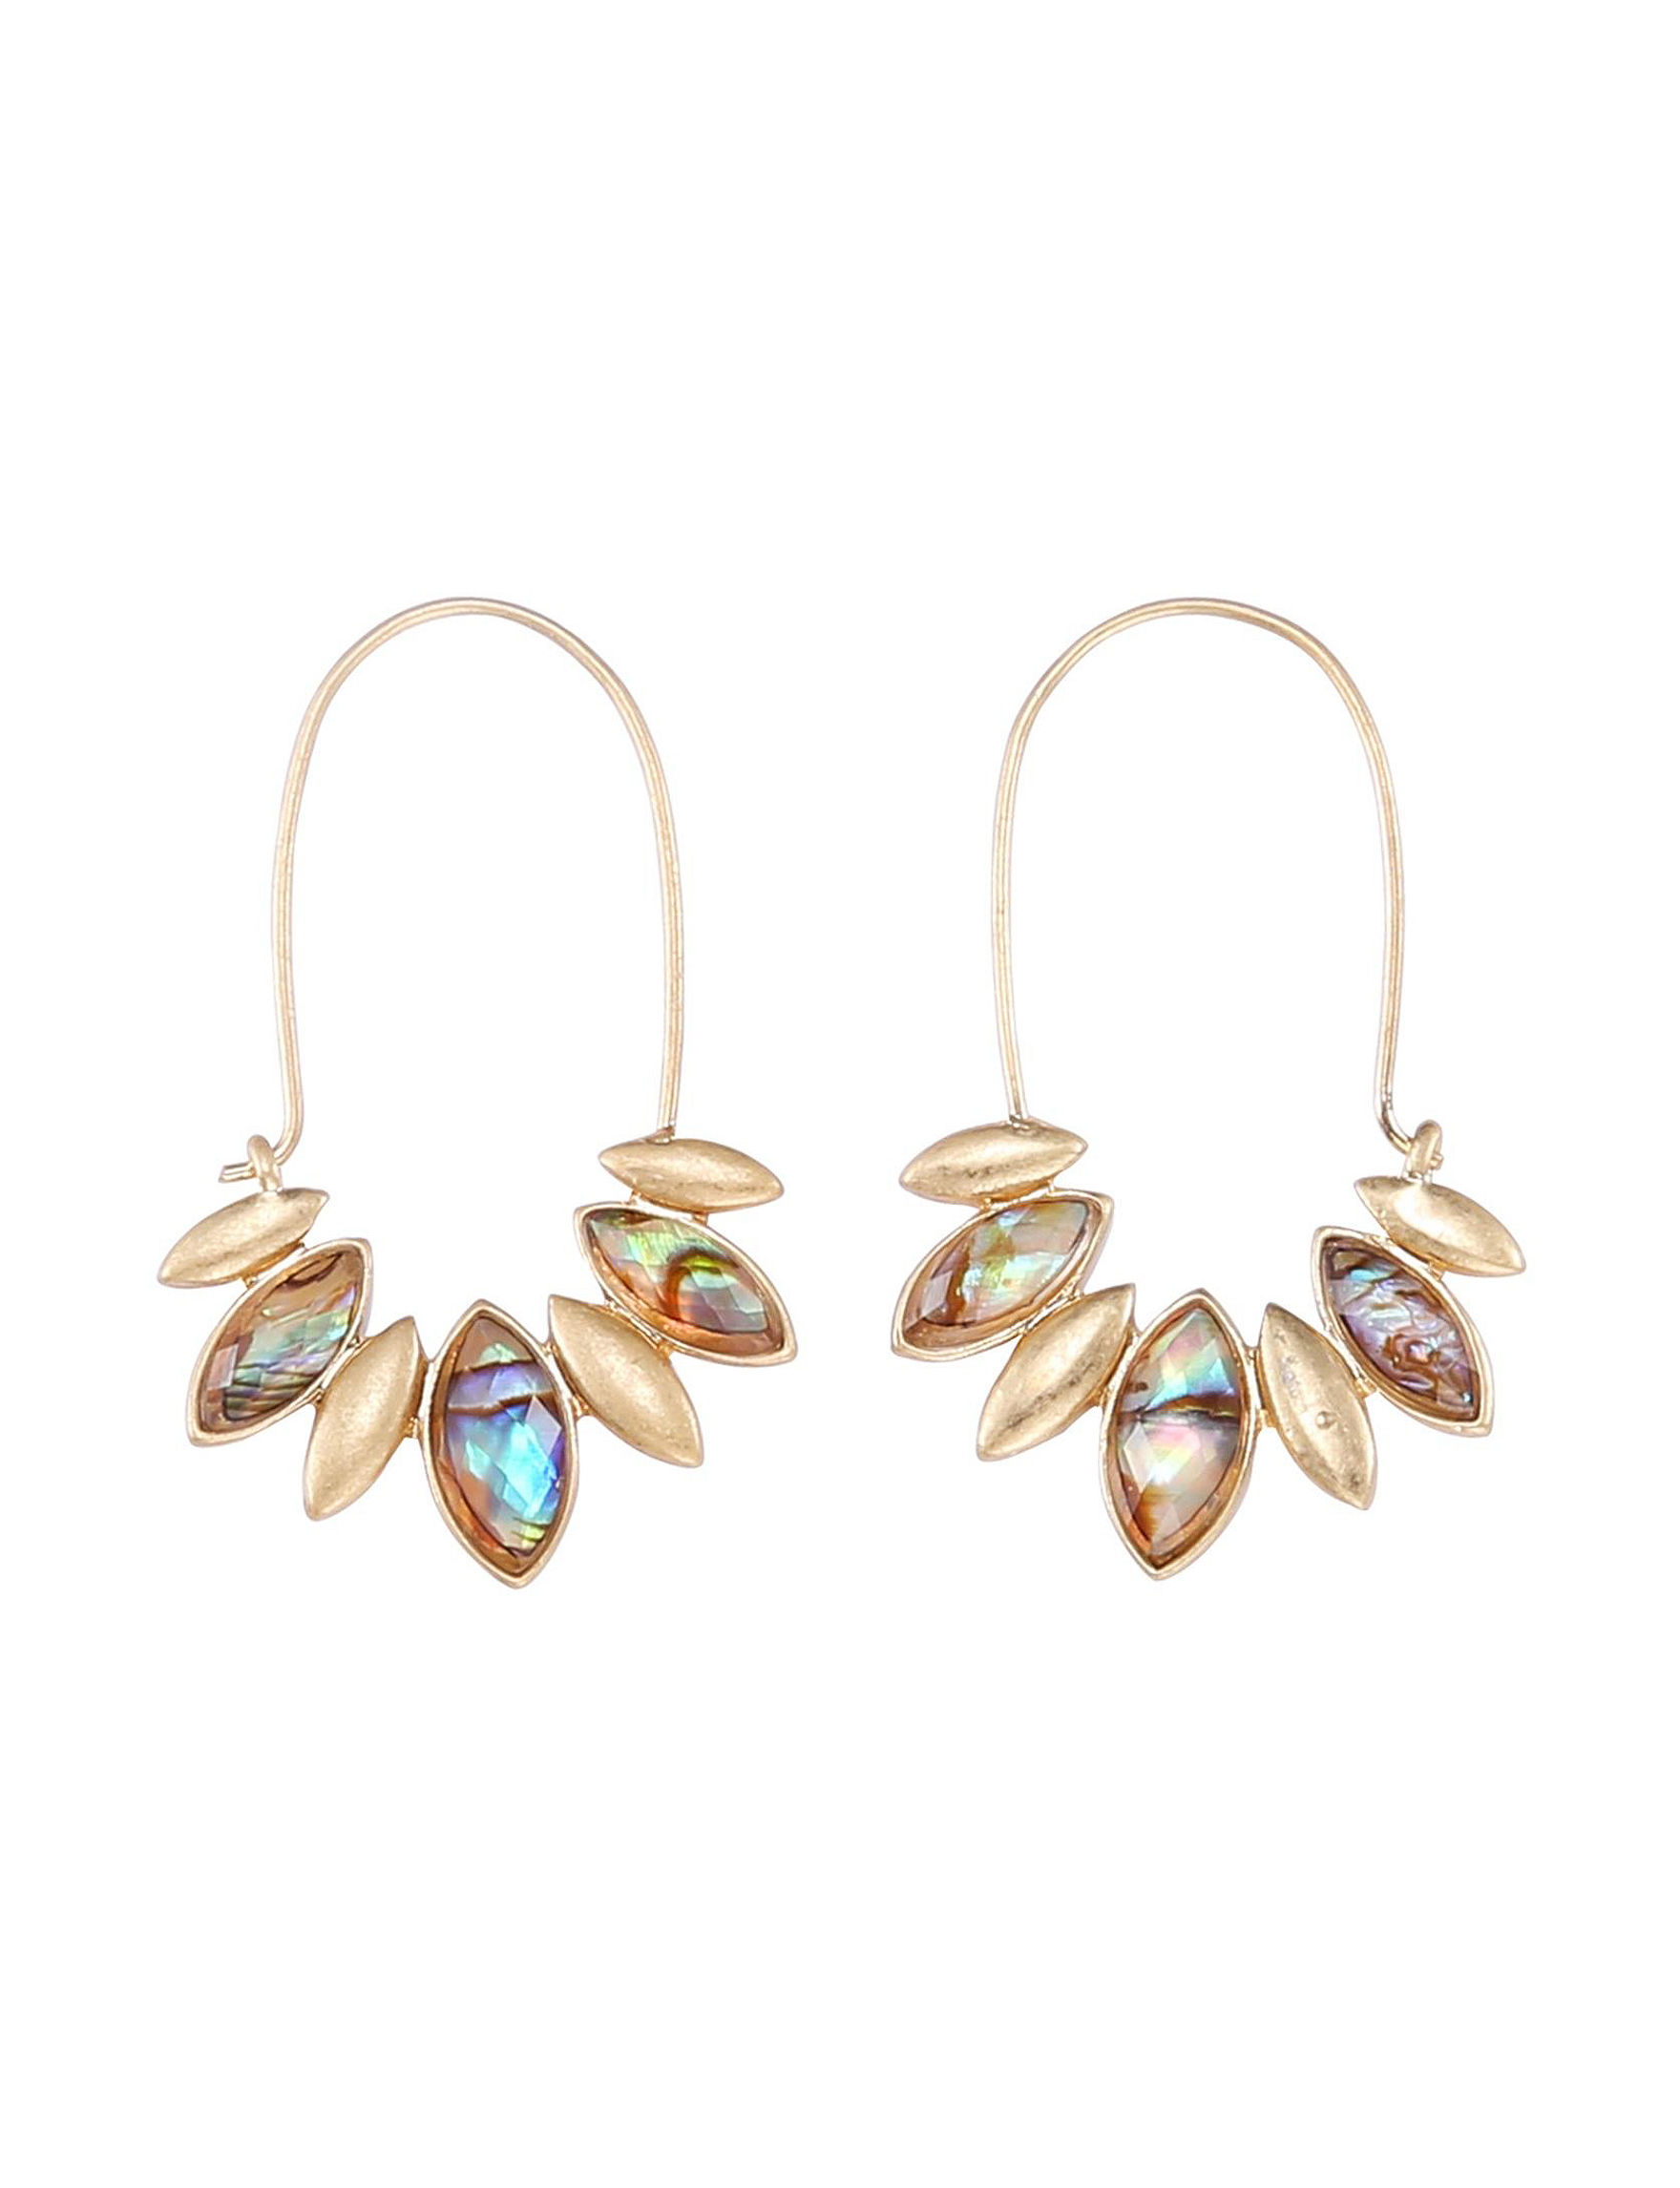 Chaps Gold / Abalone Drops Earrings Fashion Jewelry